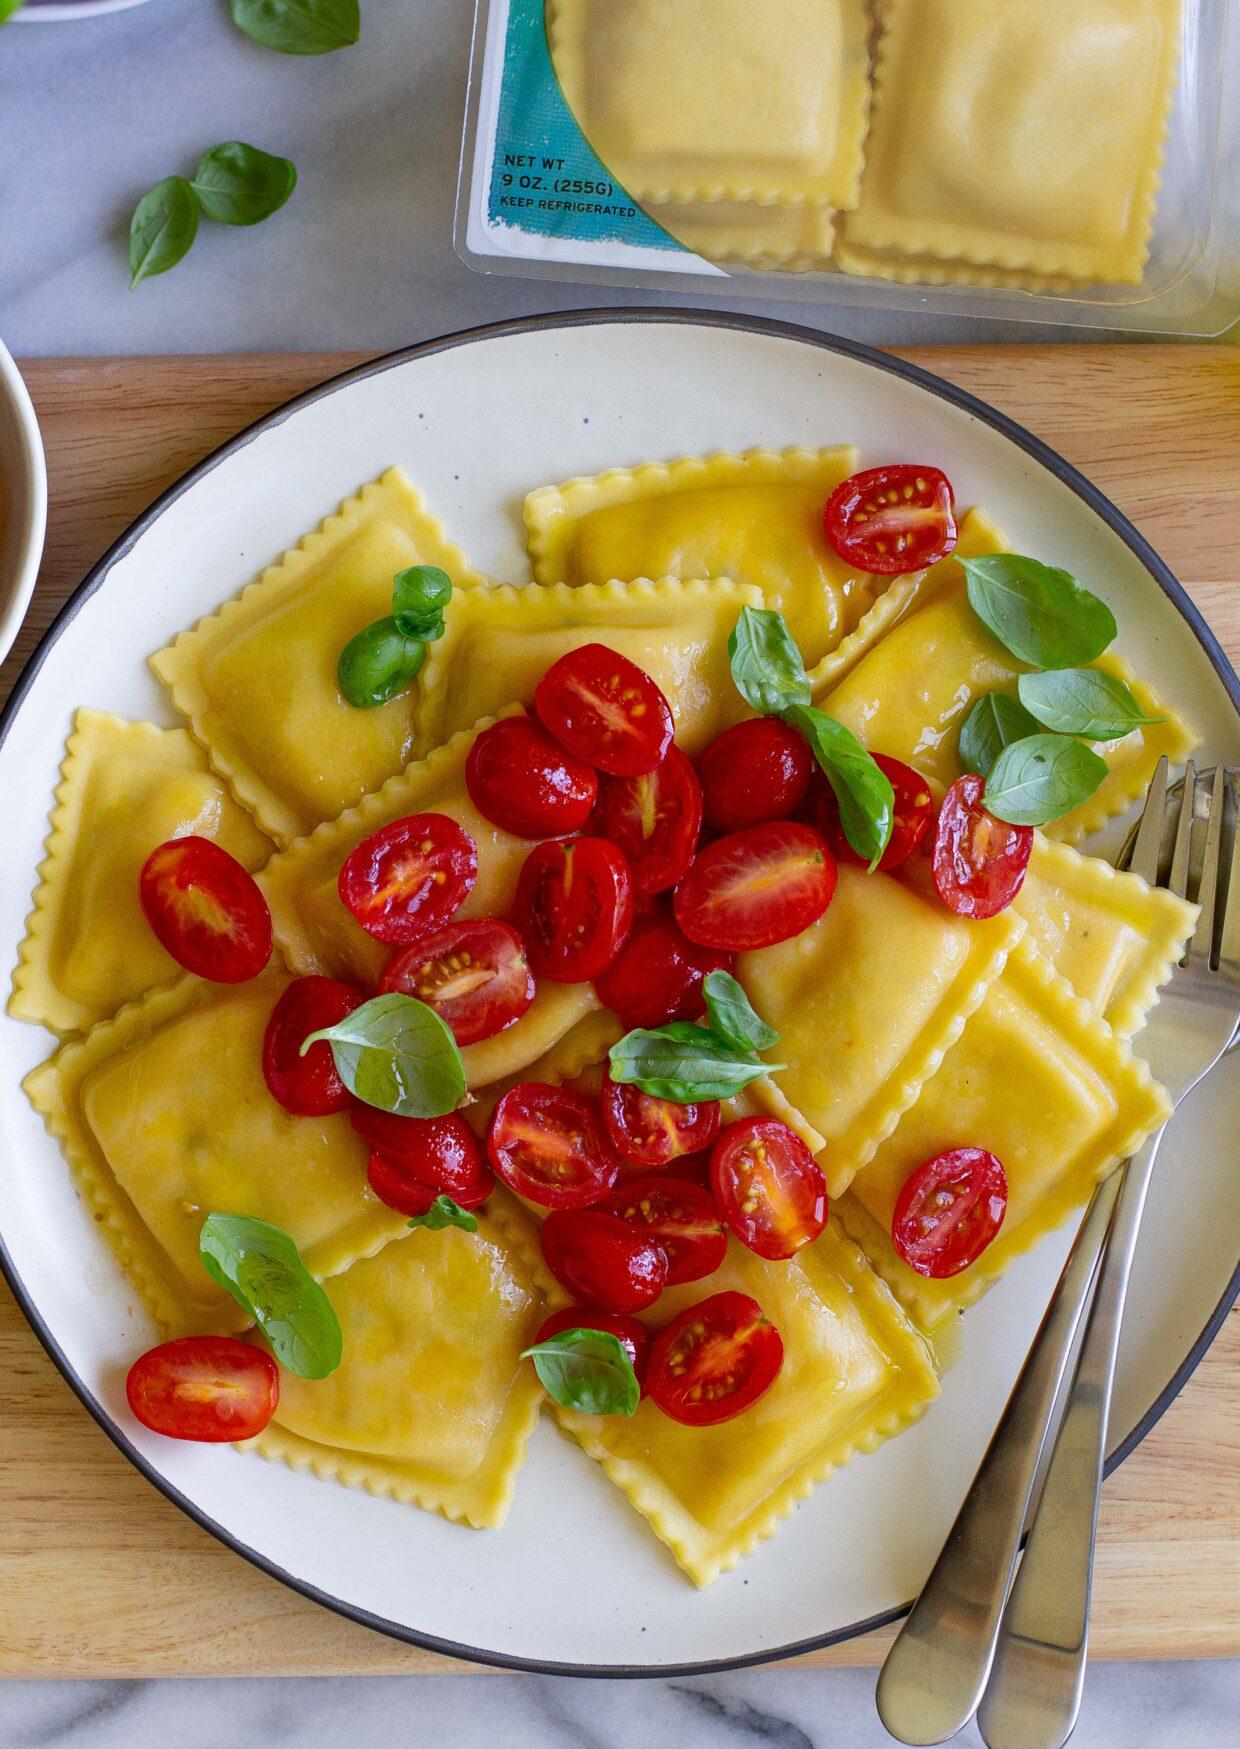 Fresh Mozzarella and Tomato Caprese Ravioli with Cherry Tomatoes, Olive Oil & Basil